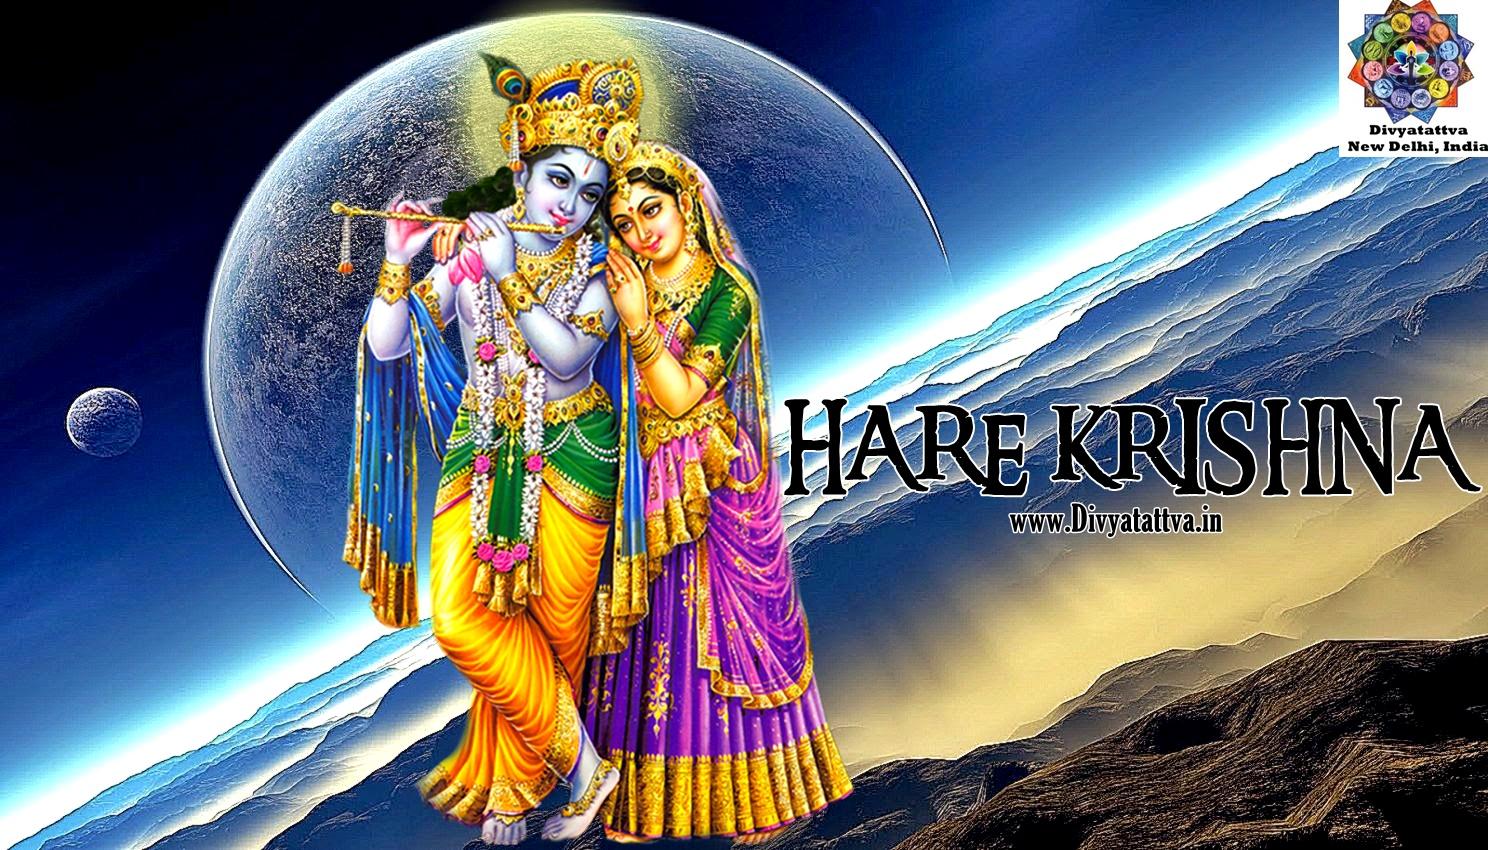 lord krishna hindu god indian gods hinduism wallpaper images mobile phone ipad www.divyatattva.in